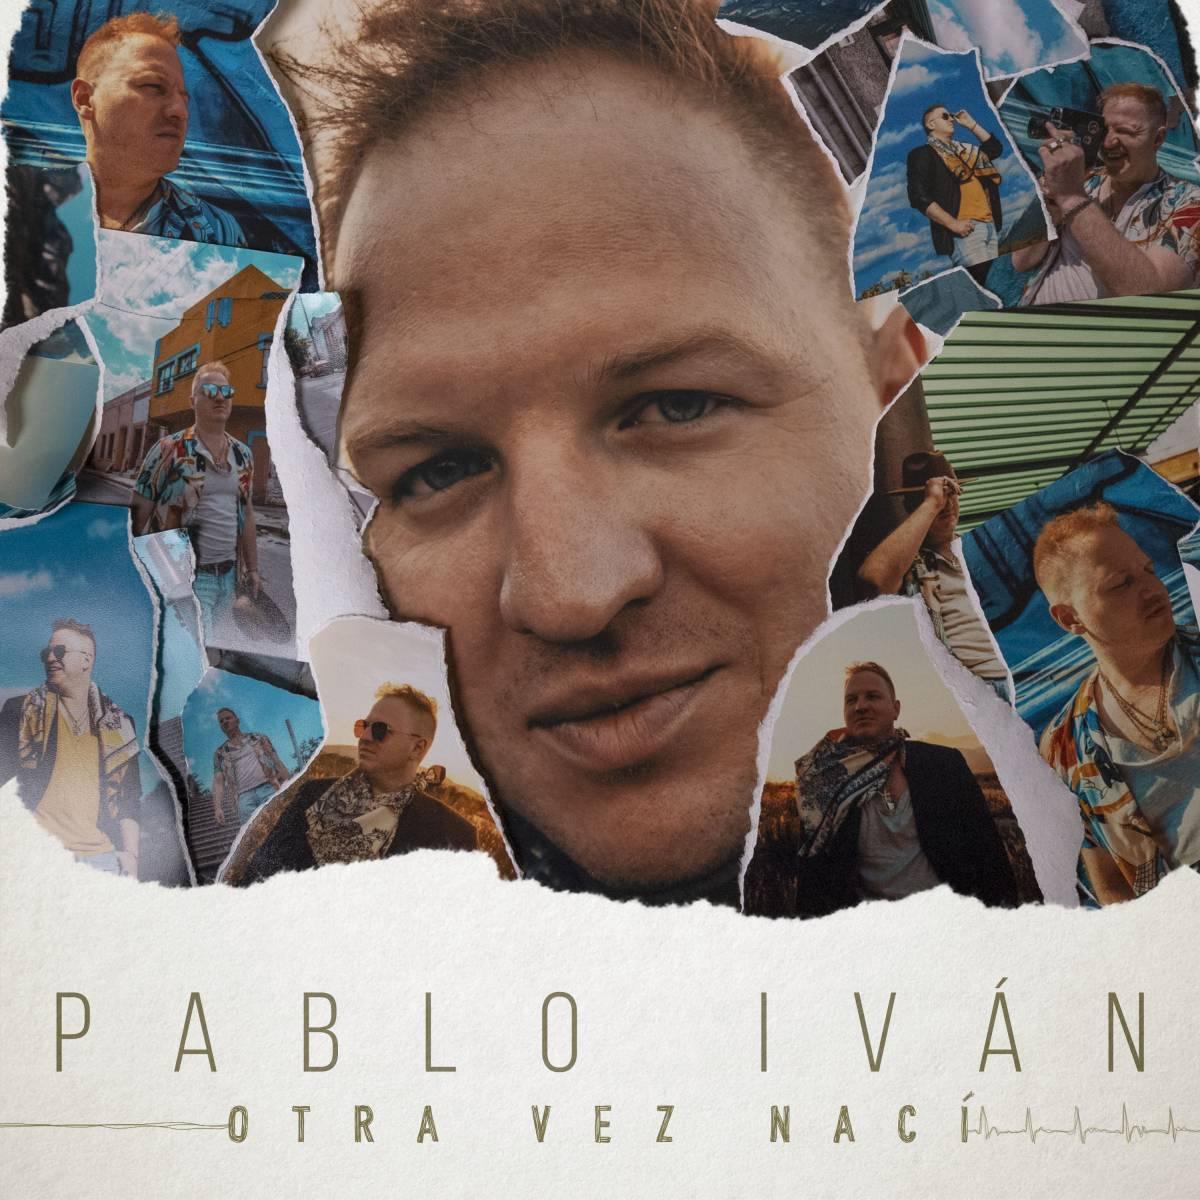 Descubriendo a cantantes de mexico: Pablo Iván